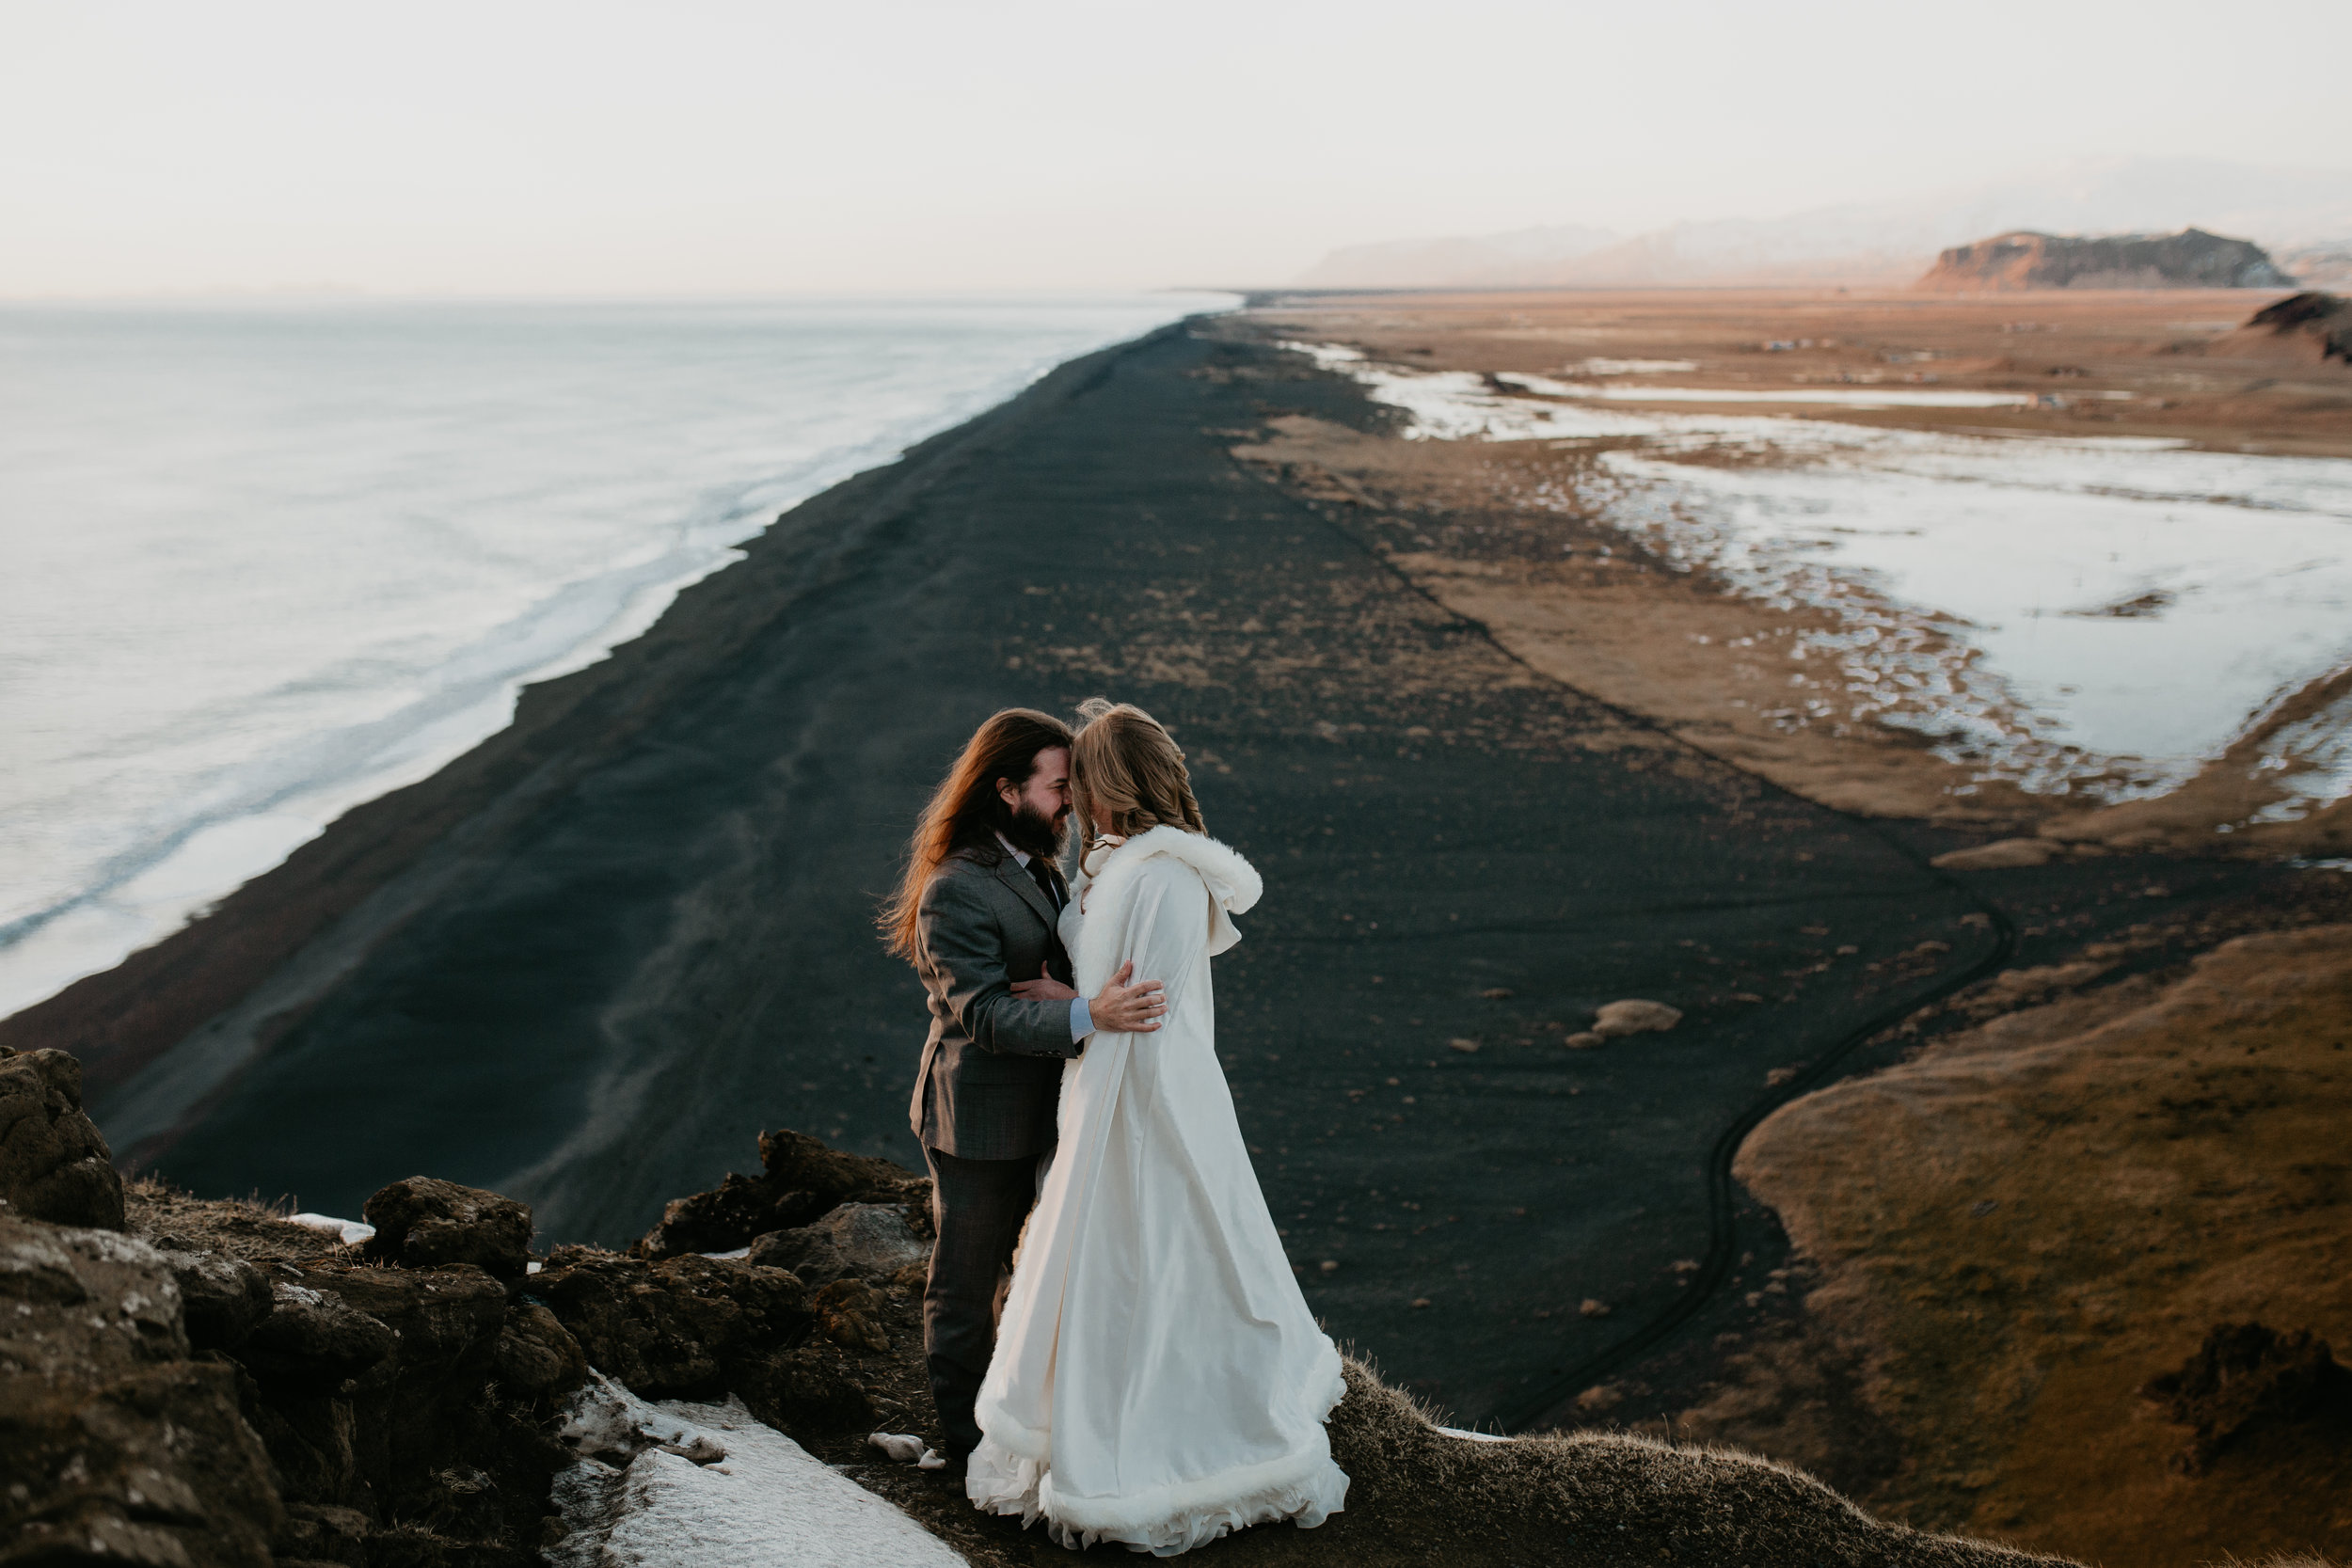 nicole-daacke-photography-iceland-winter-sunset-adventure-elopement-skogafoss-waterfall-black-sand-beach-dyrholaey-vik-iceland-intimate-wedding-black-church-elopement-photographer-40.jpg